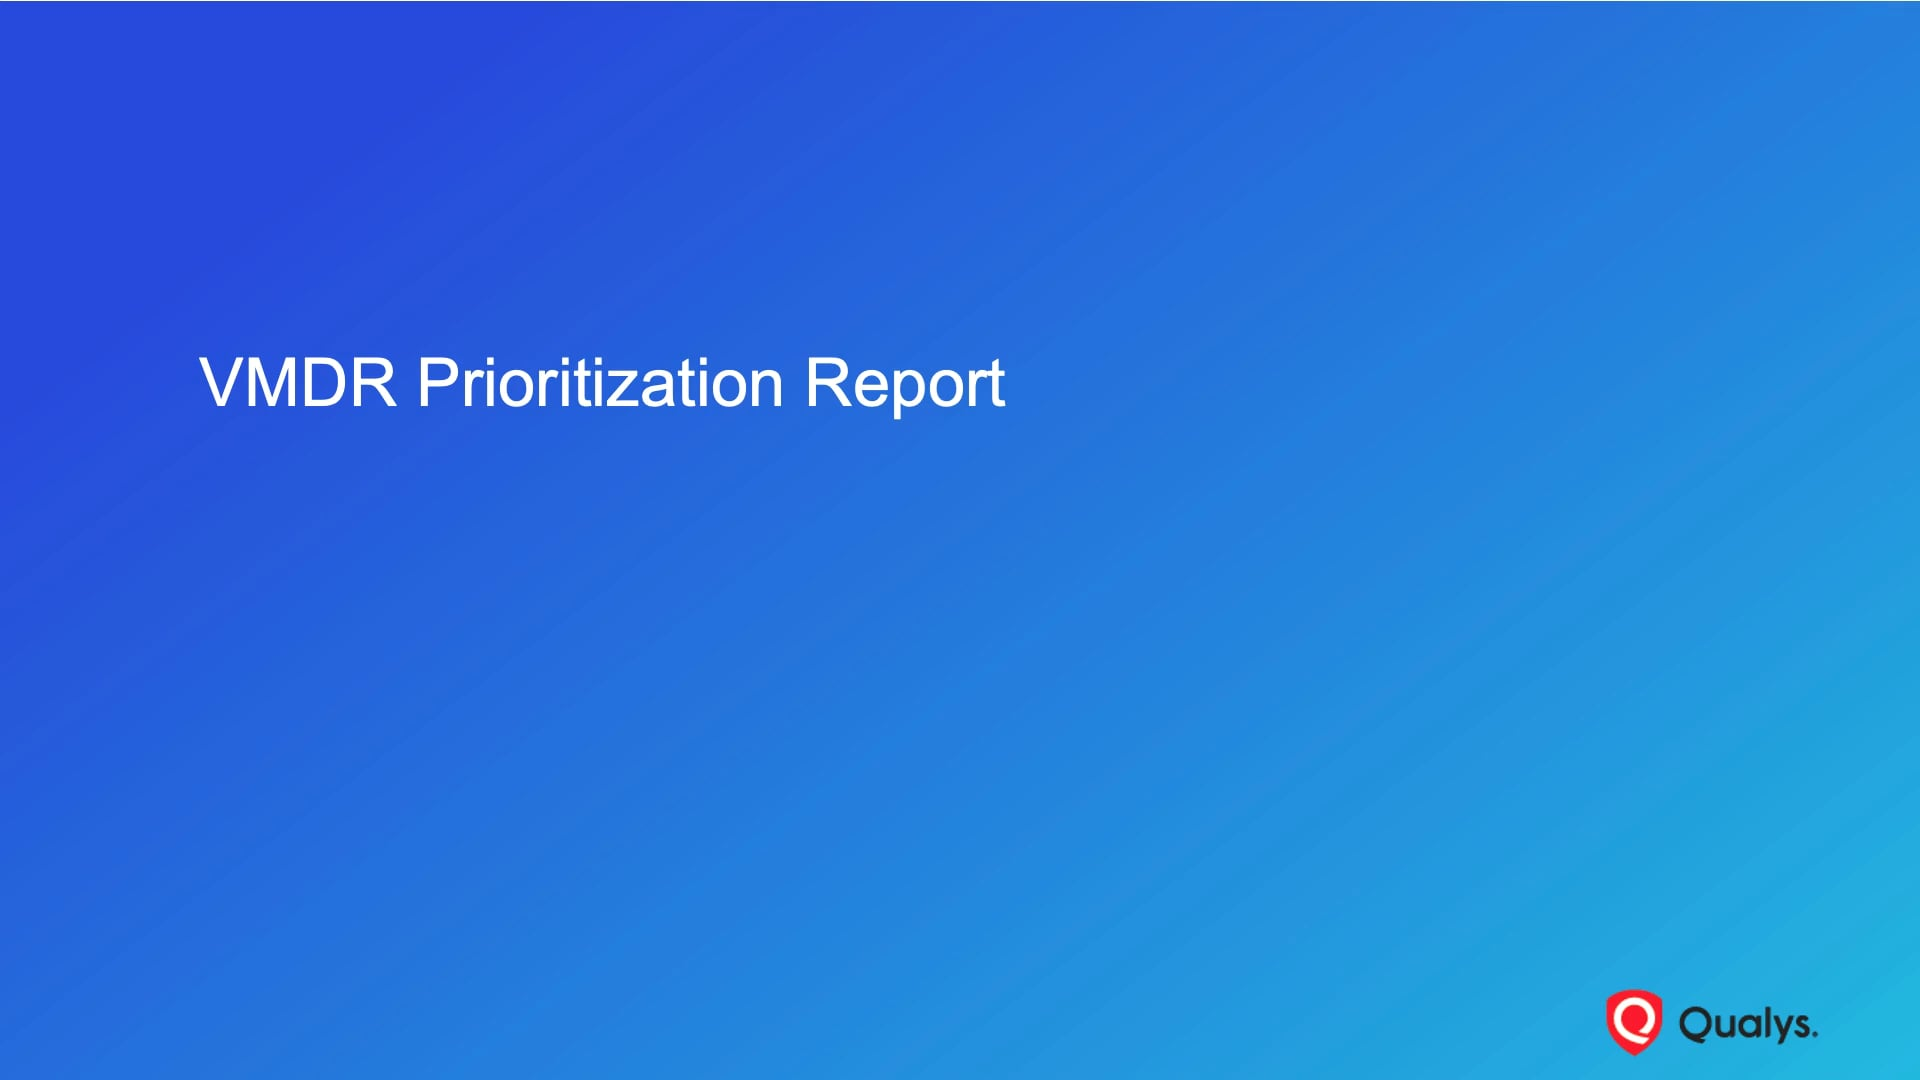 VMDR Prioritization Report